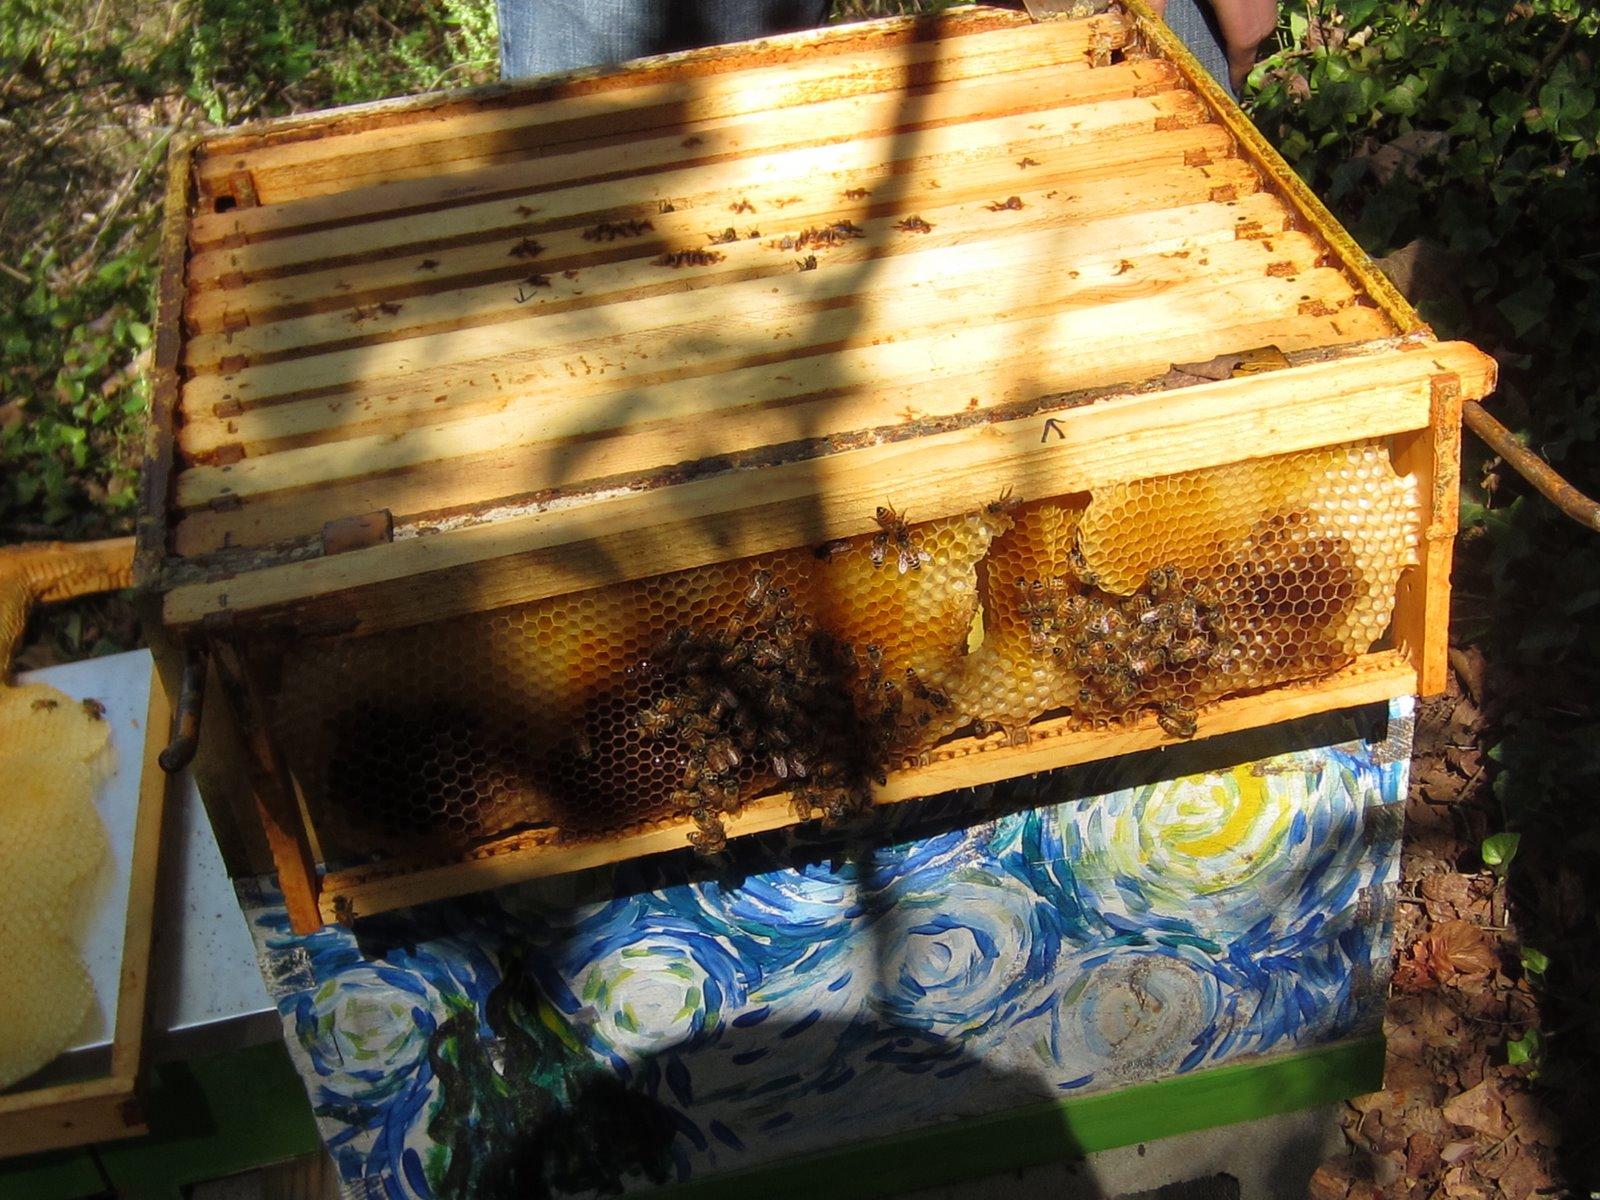 linda u0027s bees consolidating a hive as winter preparation